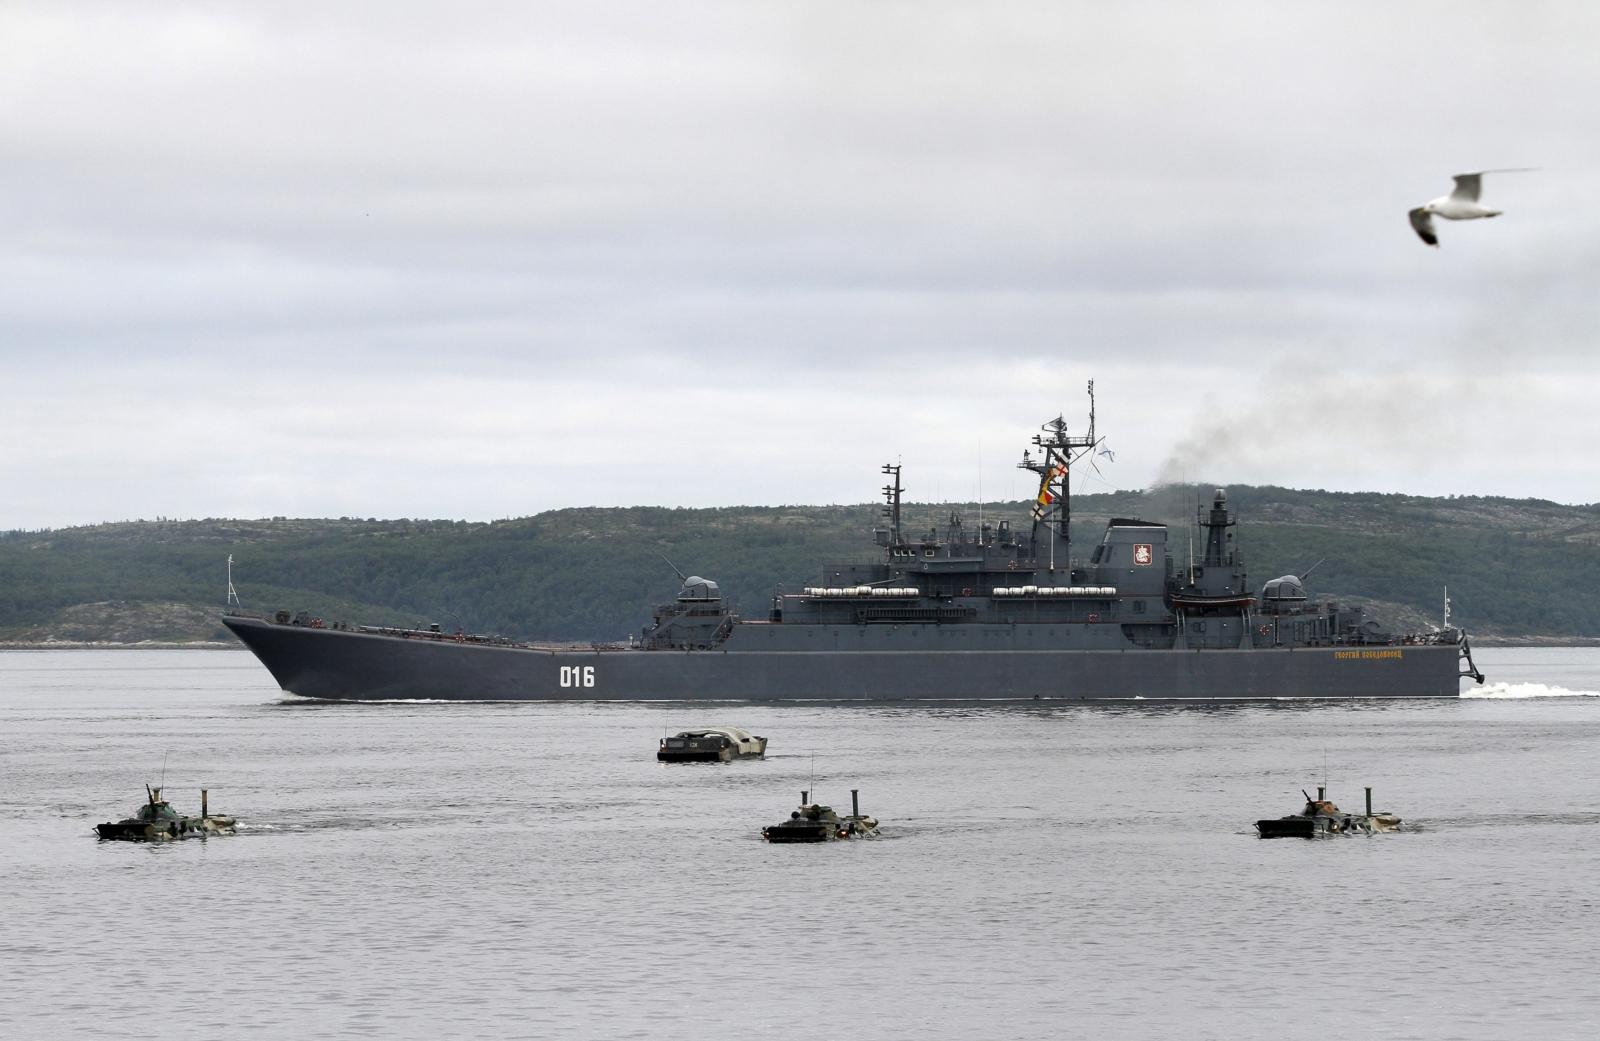 Russian warship English Channel